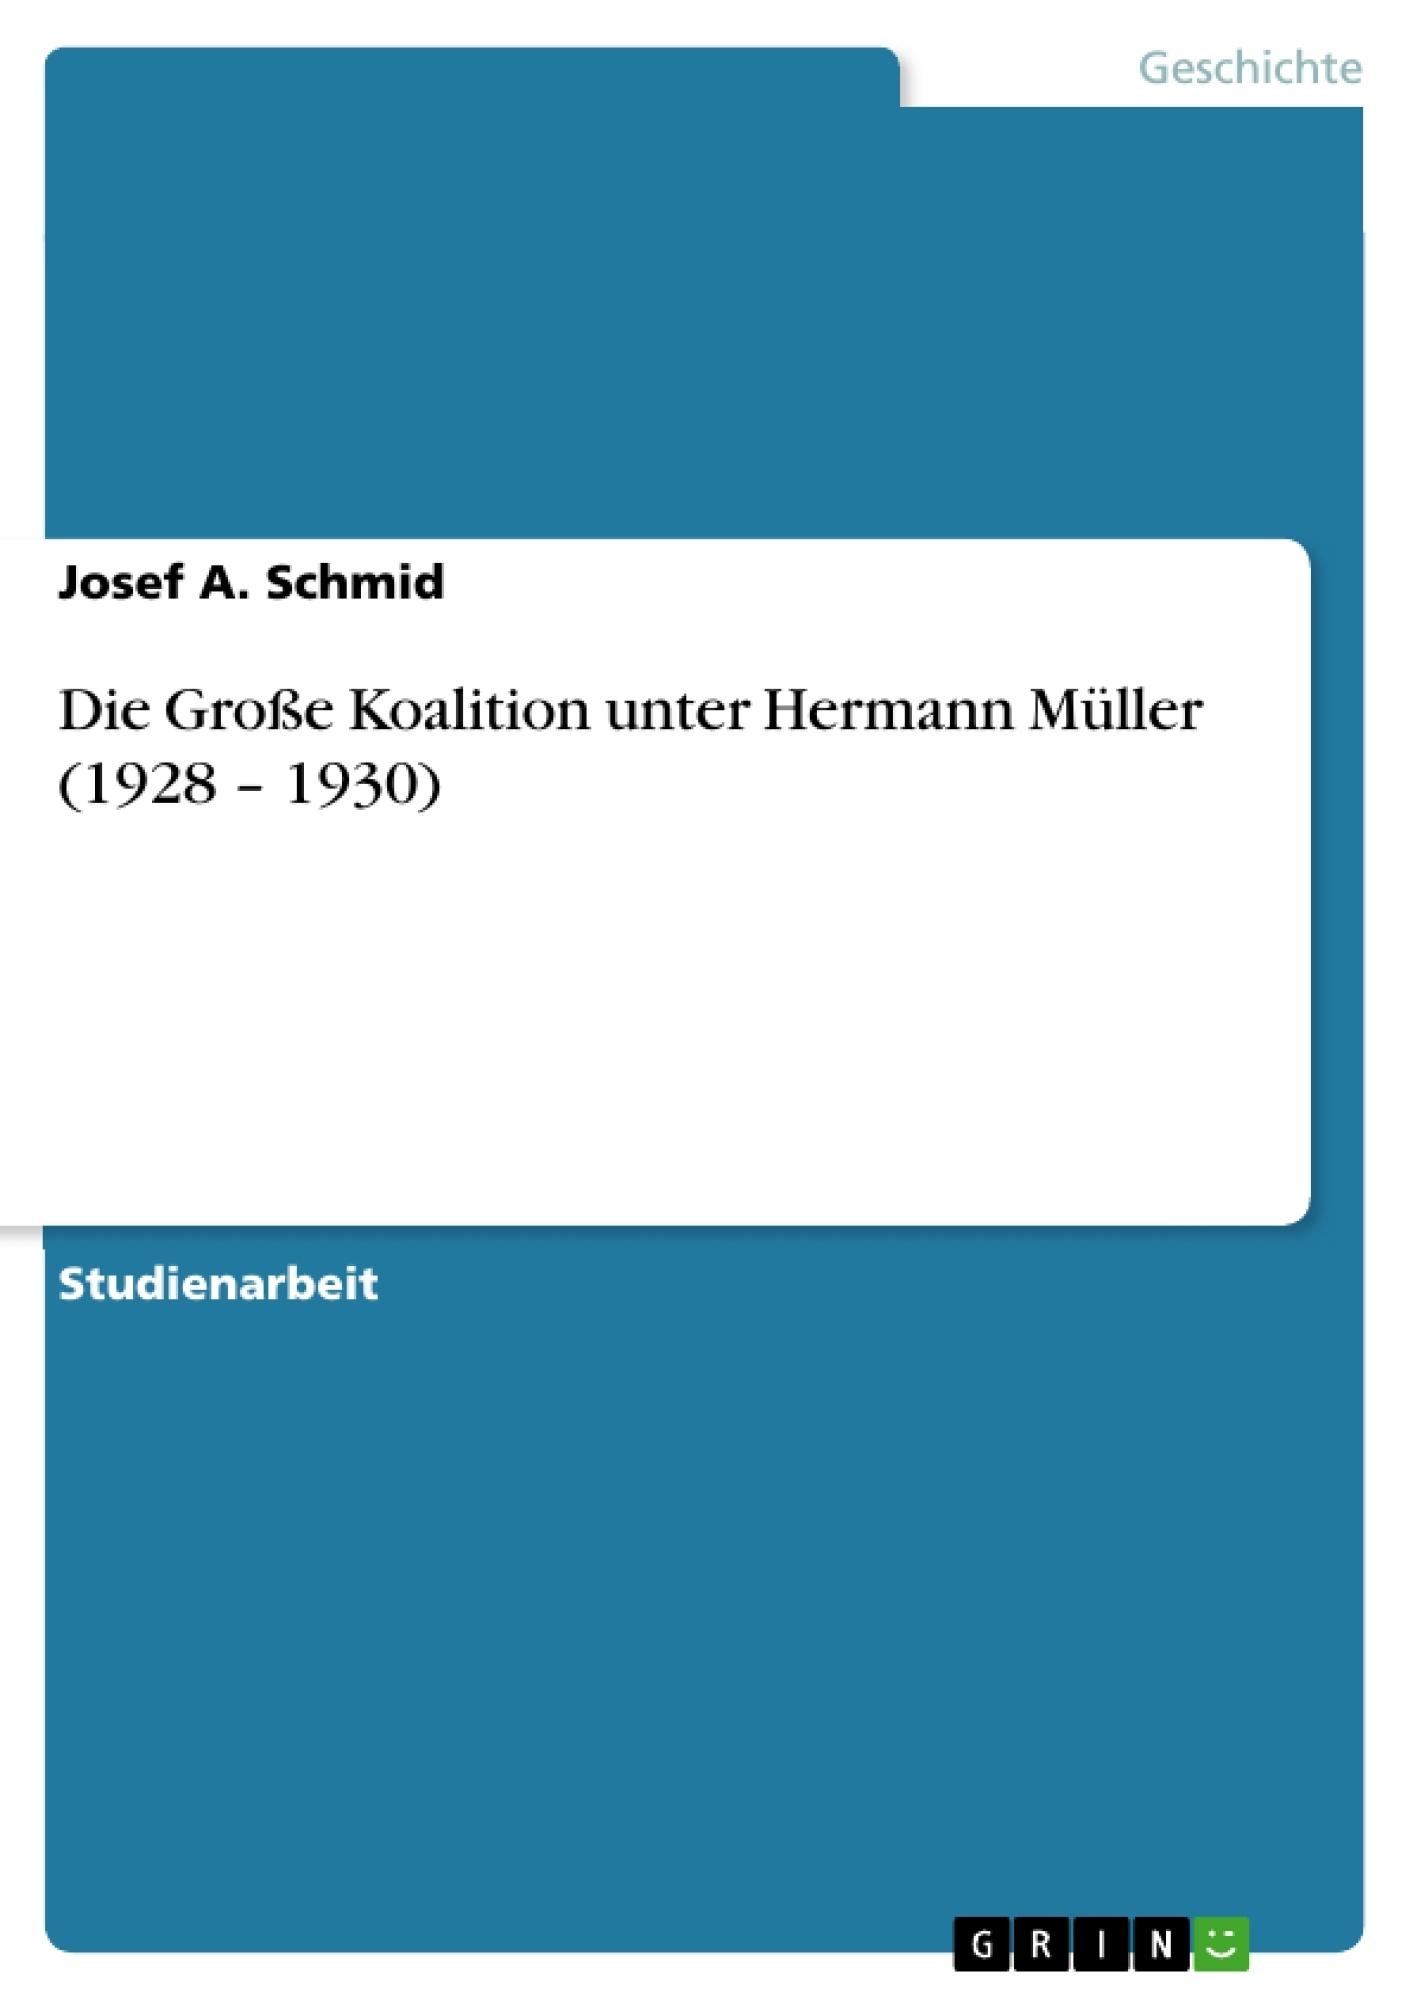 Titel: Die Große Koalition unter Hermann Müller (1928 – 1930)